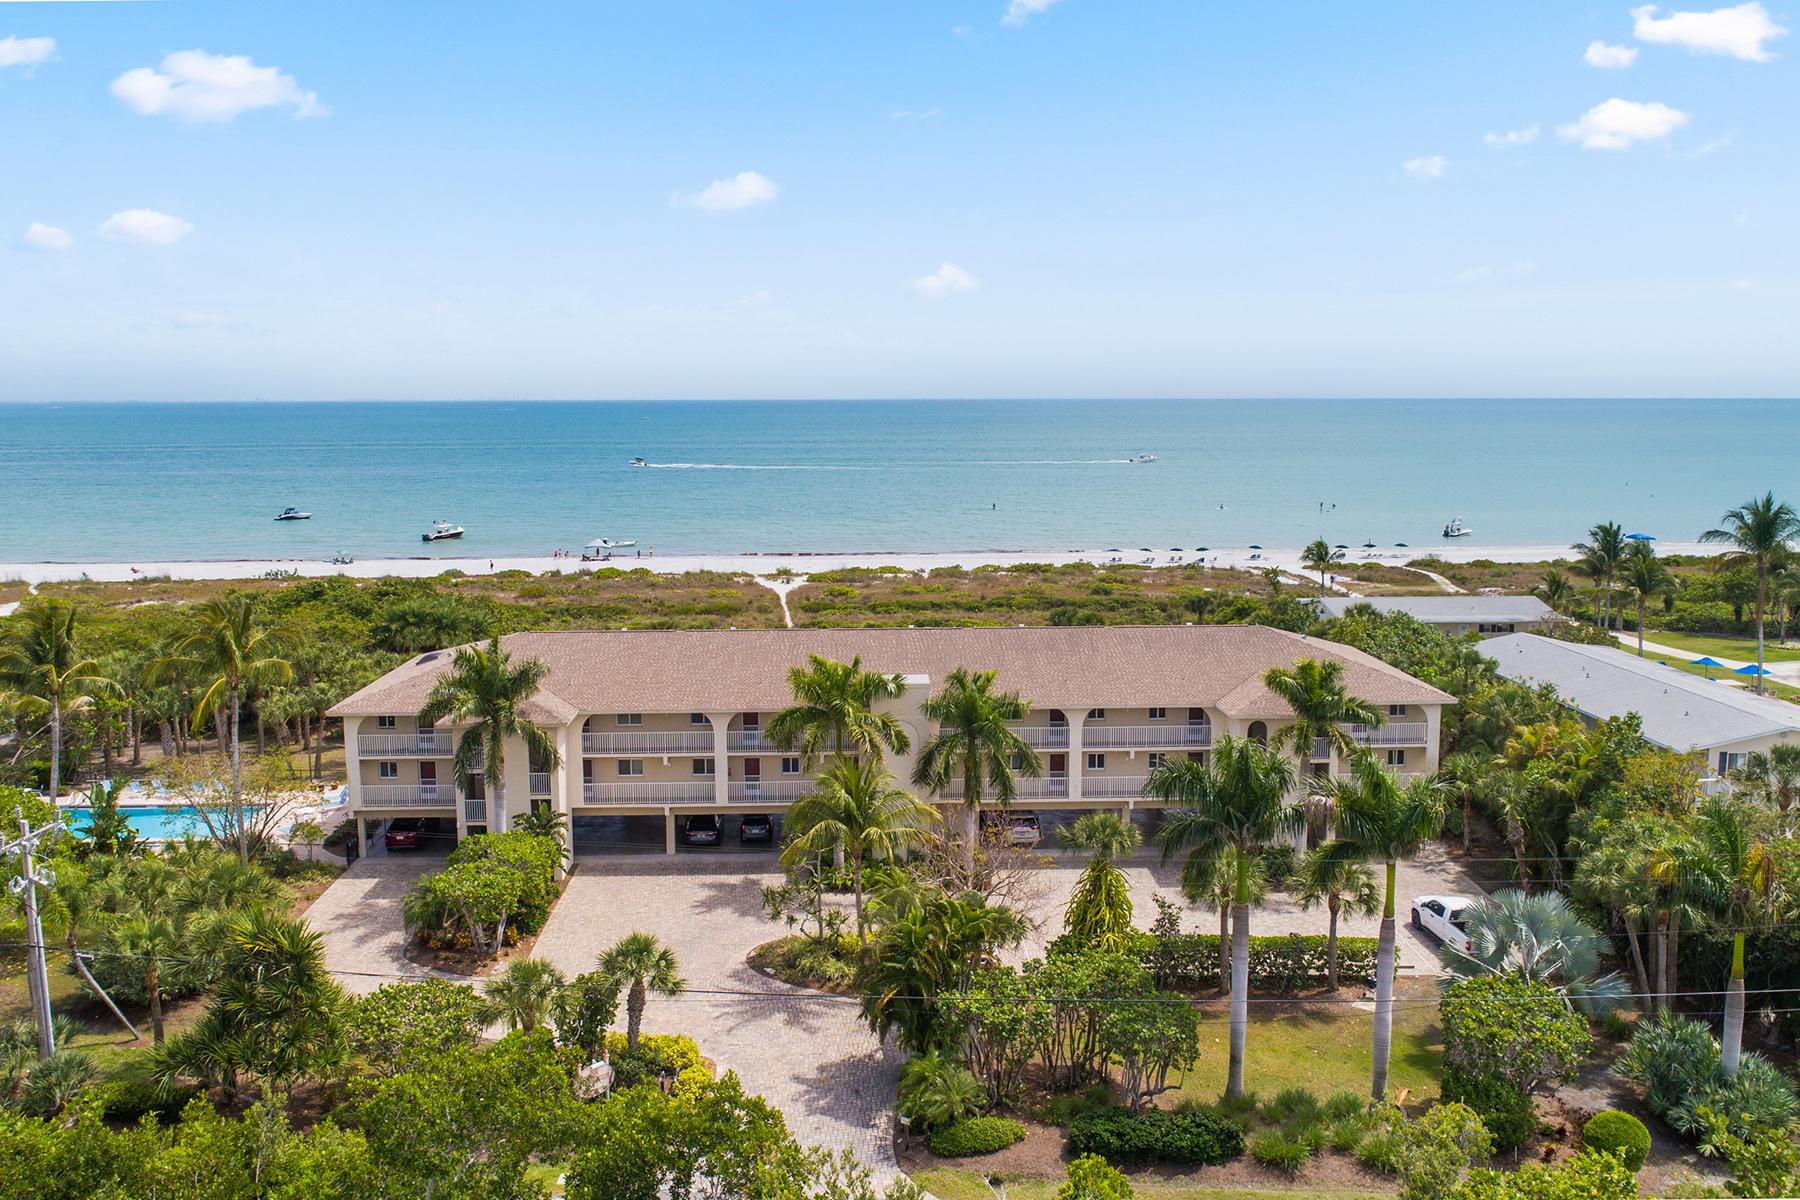 Single Family Homes for Sale at SANIBEL 527 E Gulf Dr , 107 Sanibel, Florida 33957 United States